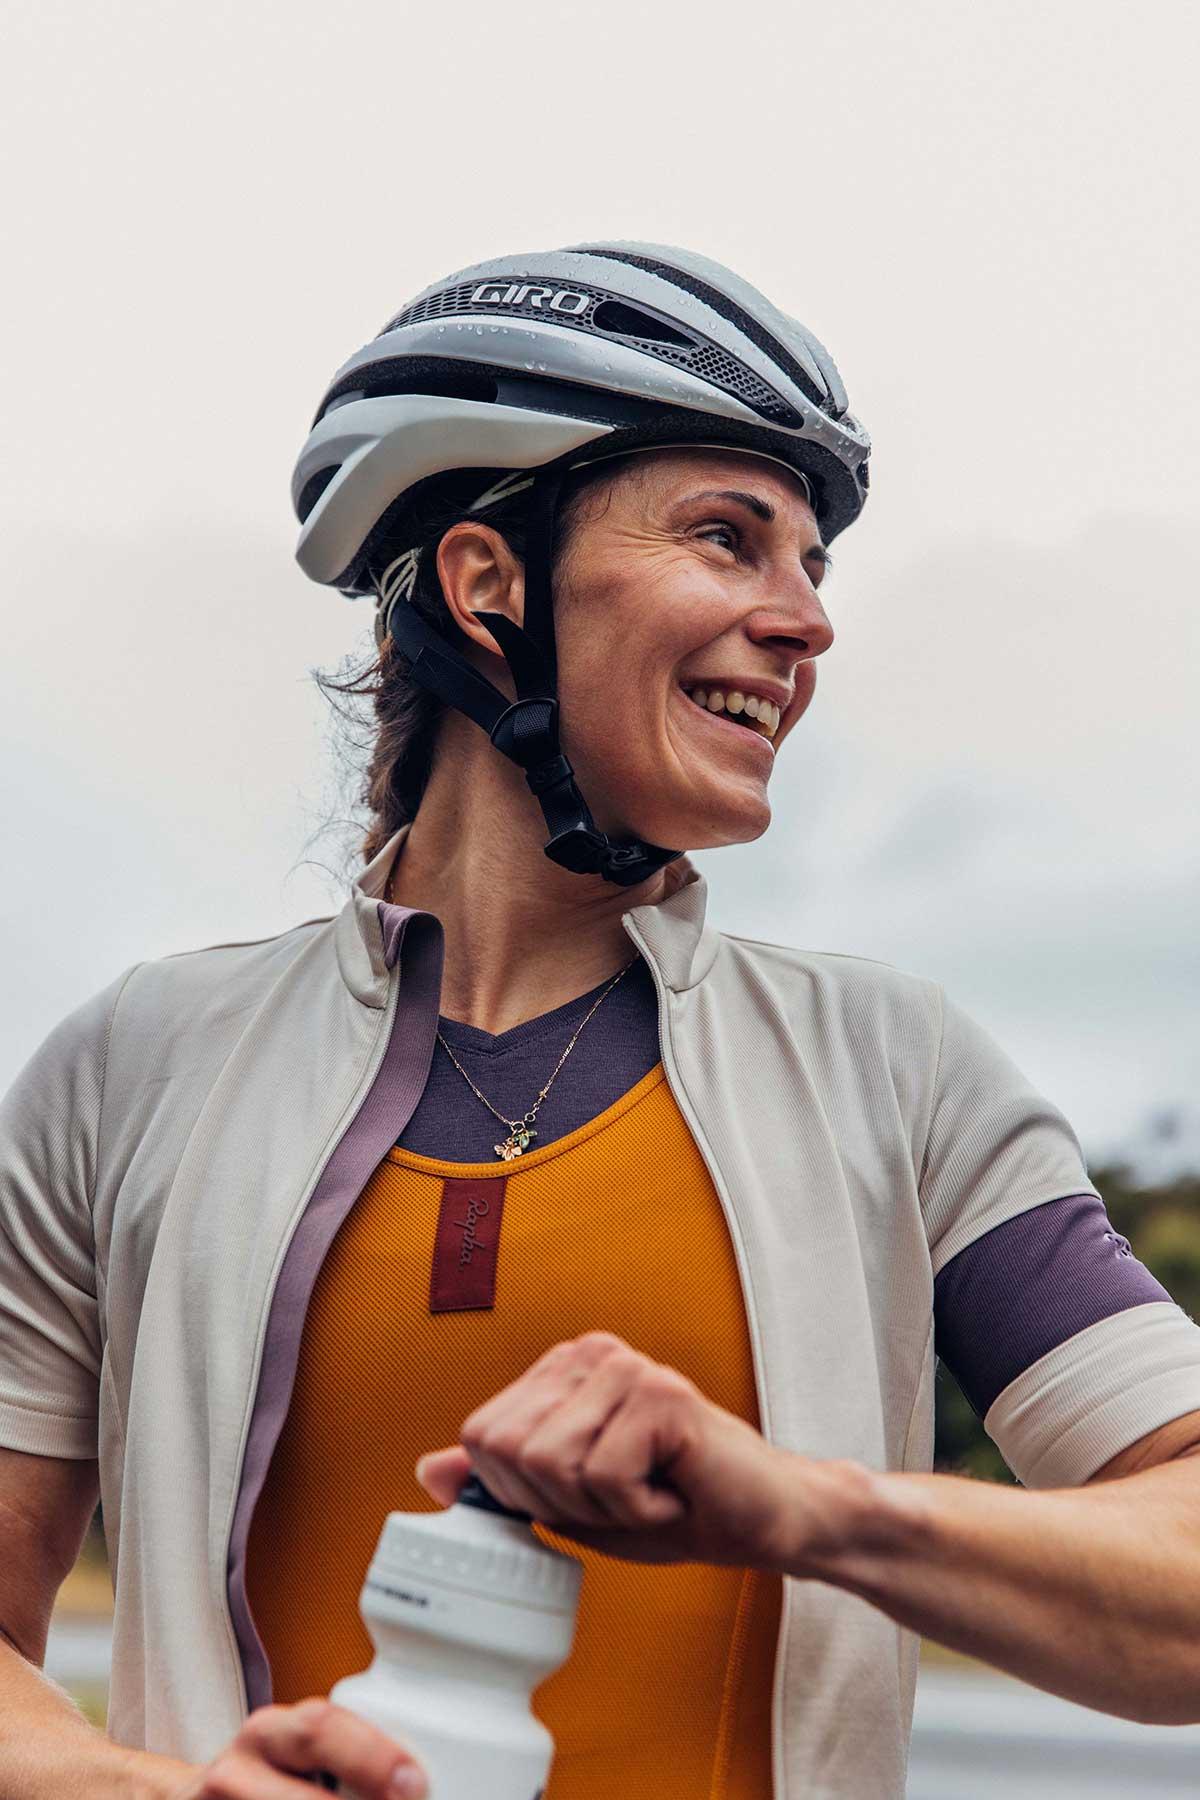 rapha classic womens road cycling jersey zipup shprt sleebe white recycled fabric merino wool blend